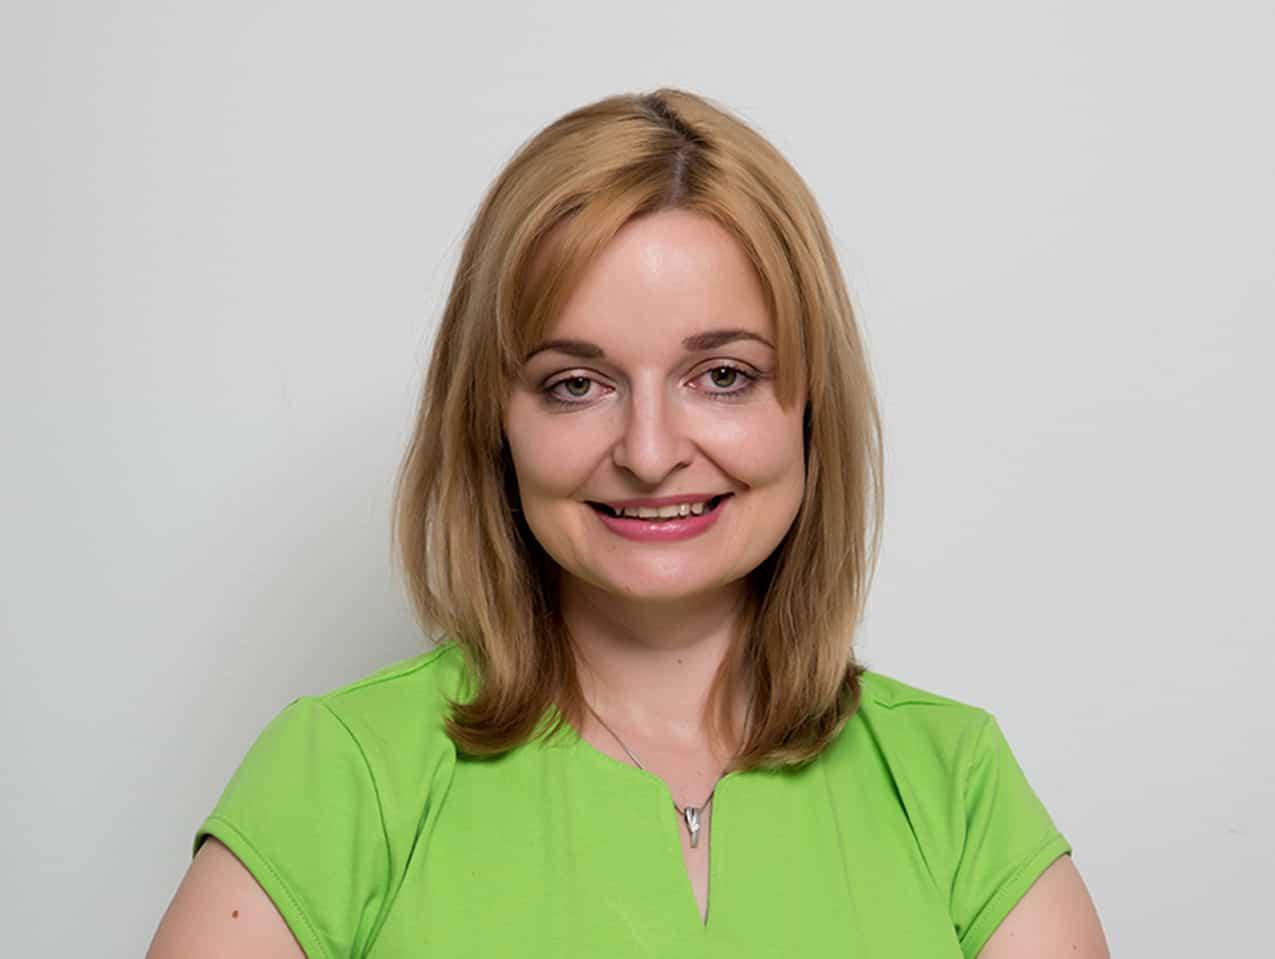 Bc. Veronika Urbankova, DiS.